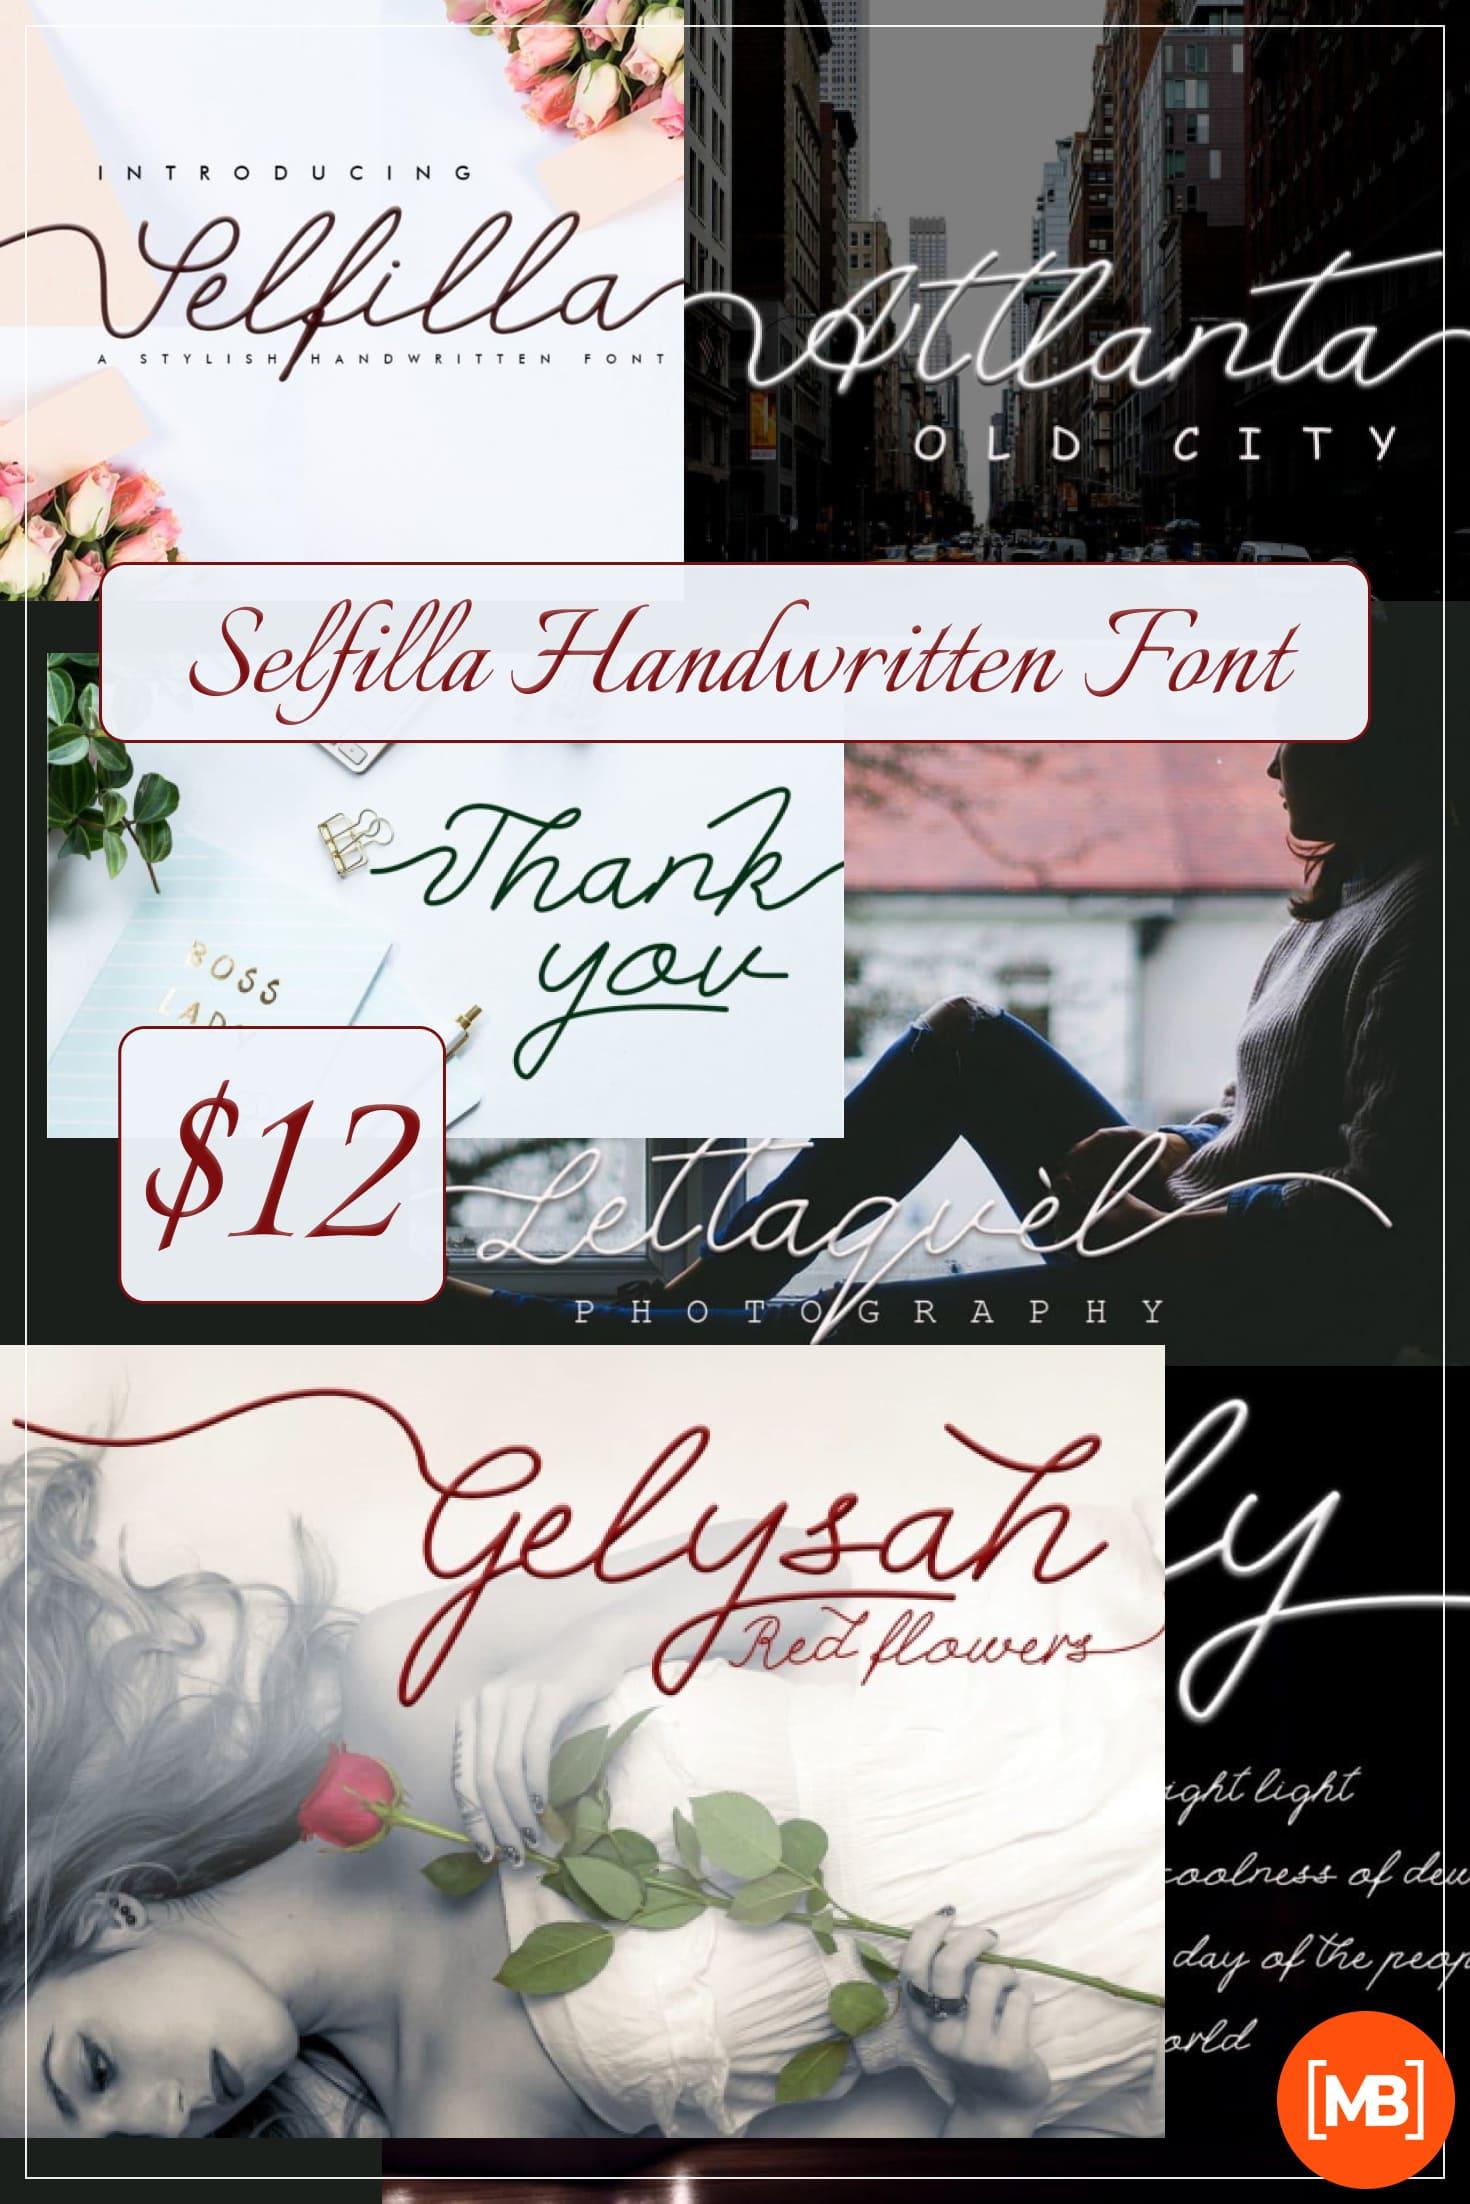 Pinterest Image: Selfilla Handwritten Font - $12.